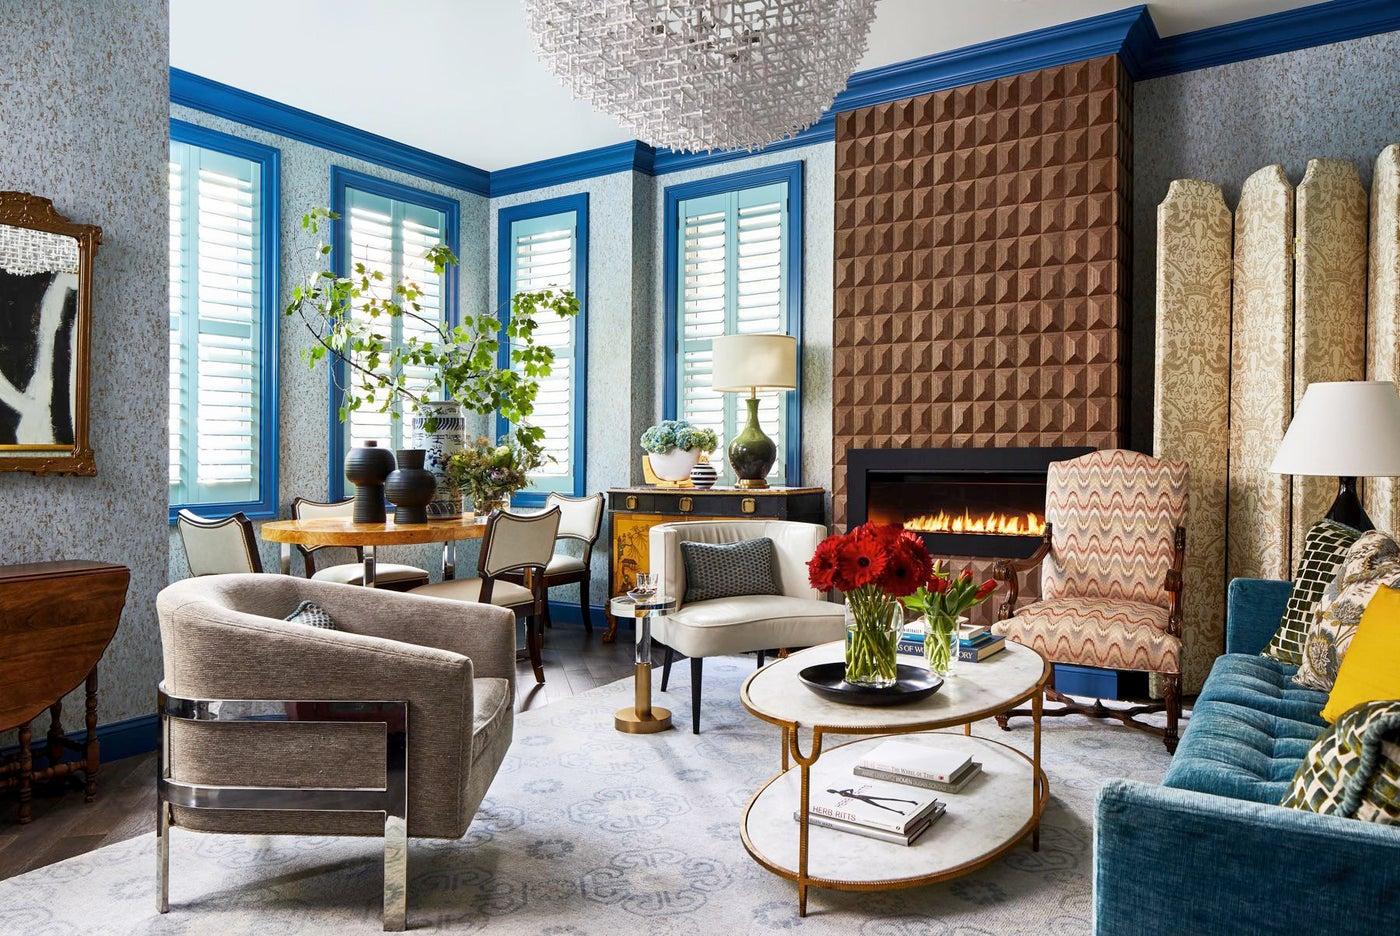 Wood Veneer Fireplace Living Space Mixed Metals Coffee Table Blue Trim Rug